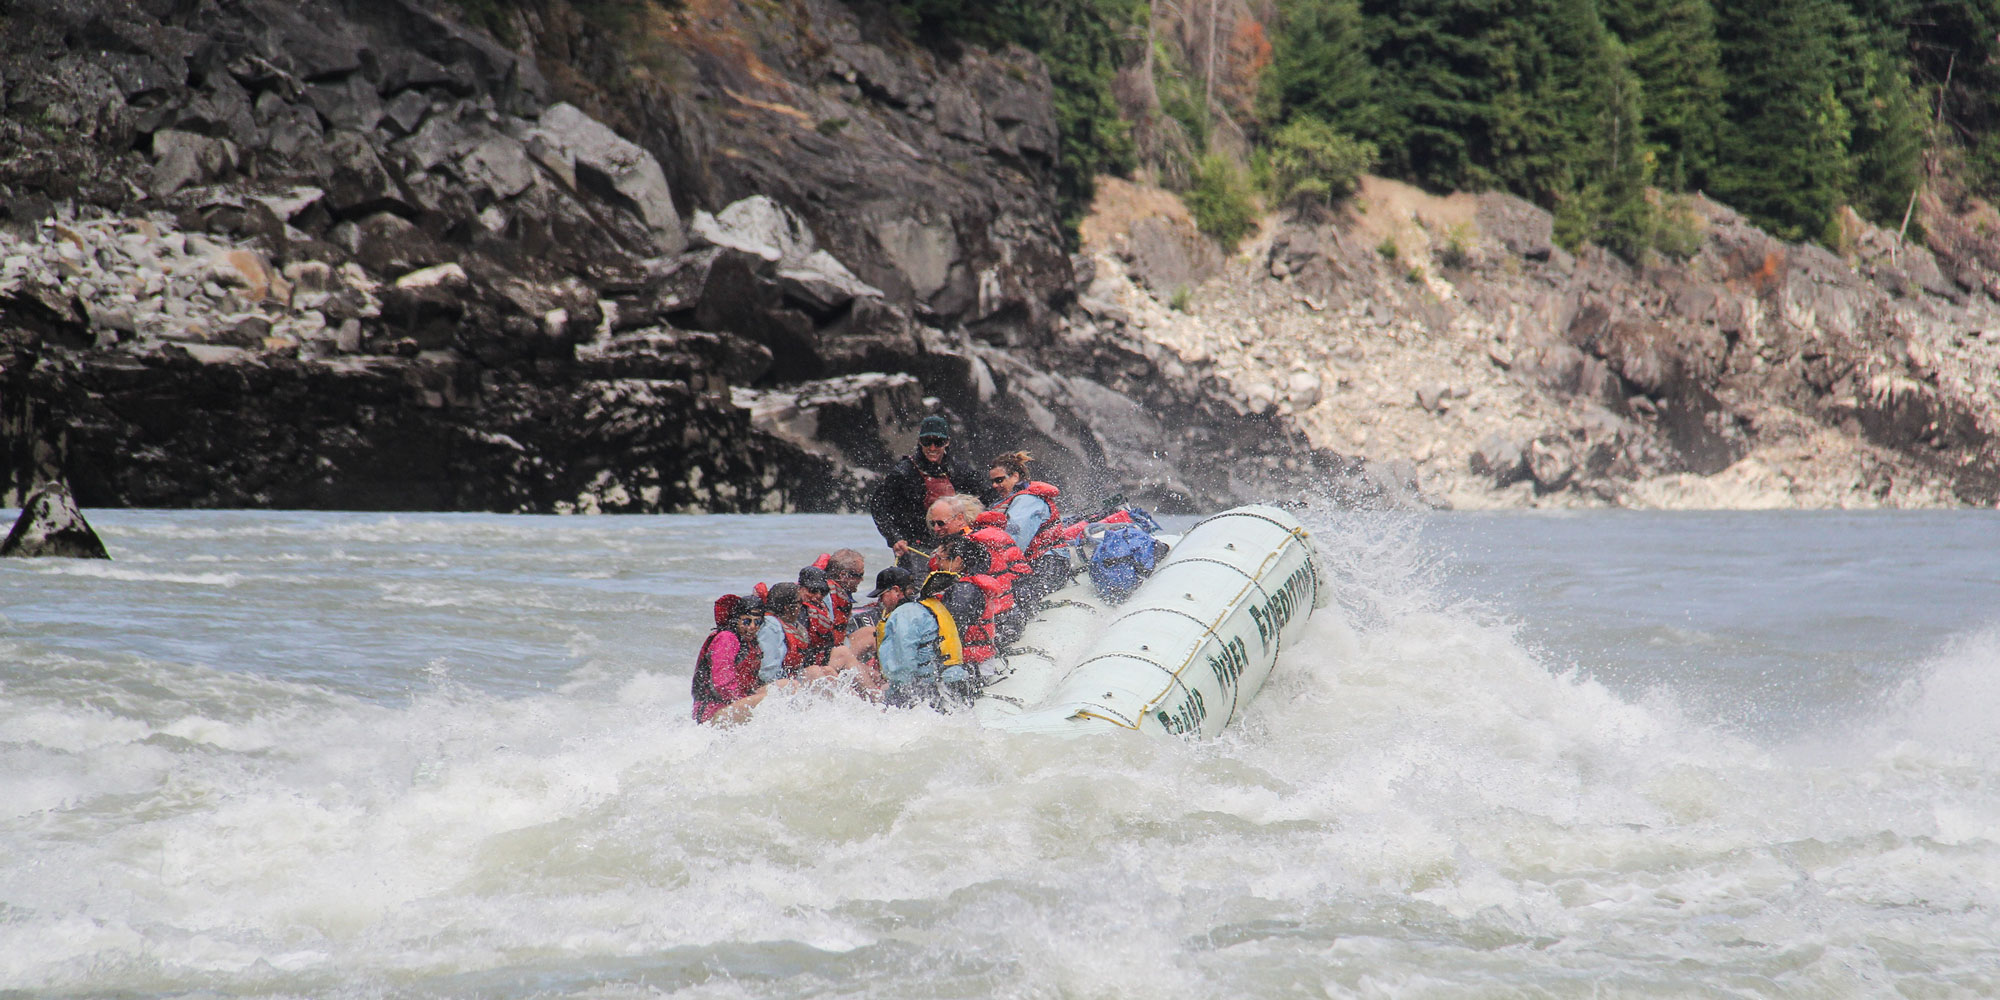 Fraser River Rafting